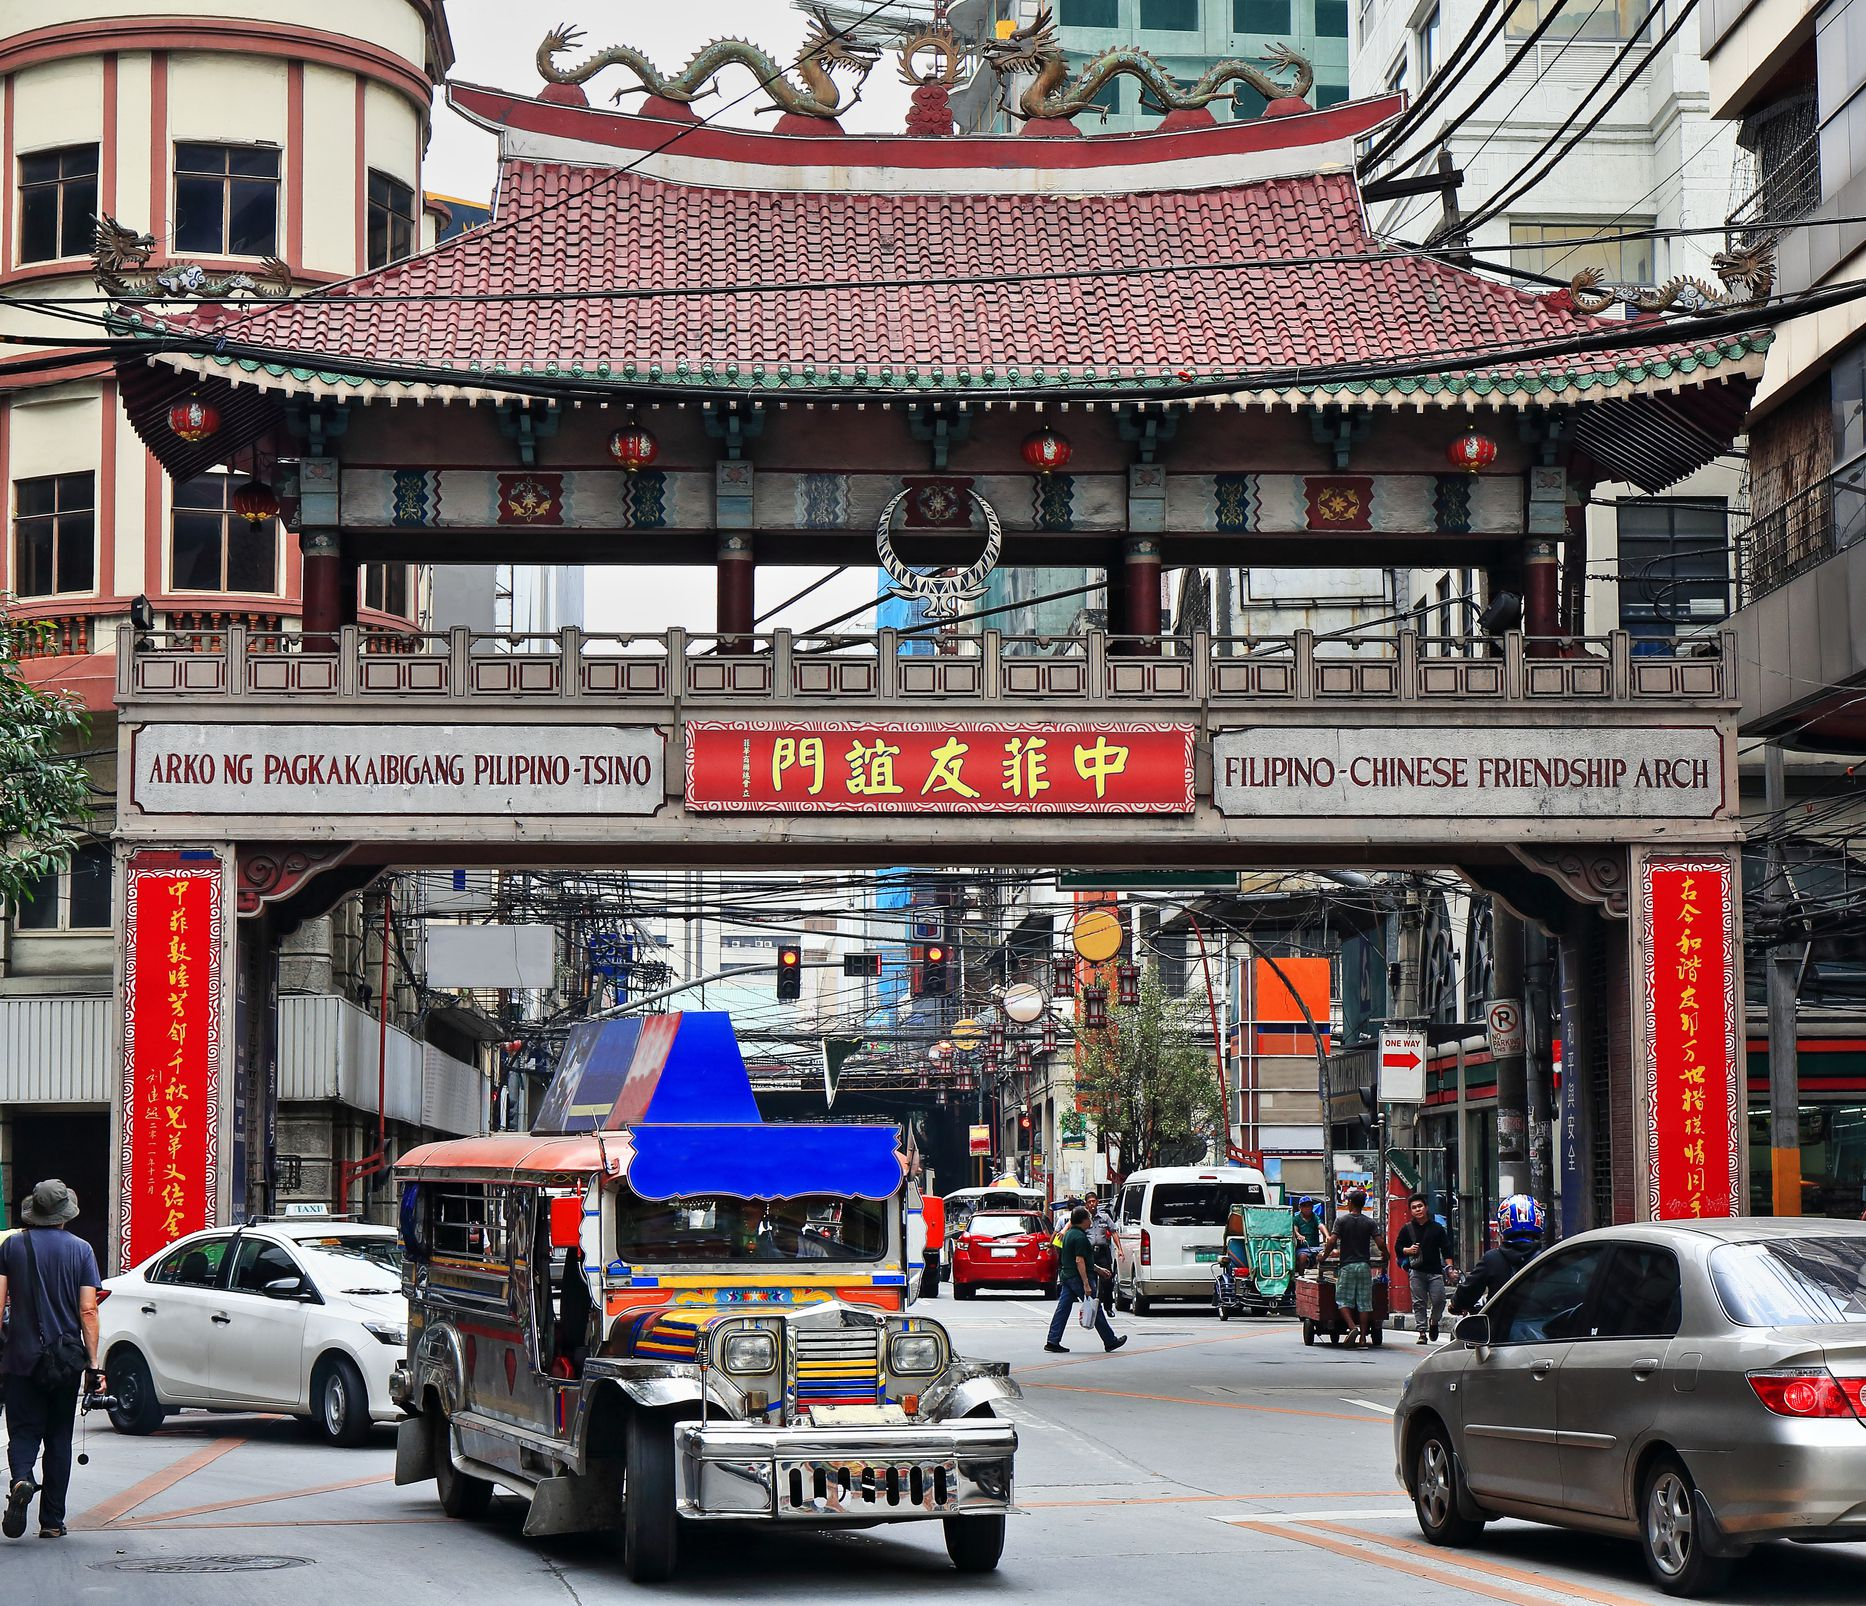 Friendship arch at entrance to Binondo, Manila, Philippines